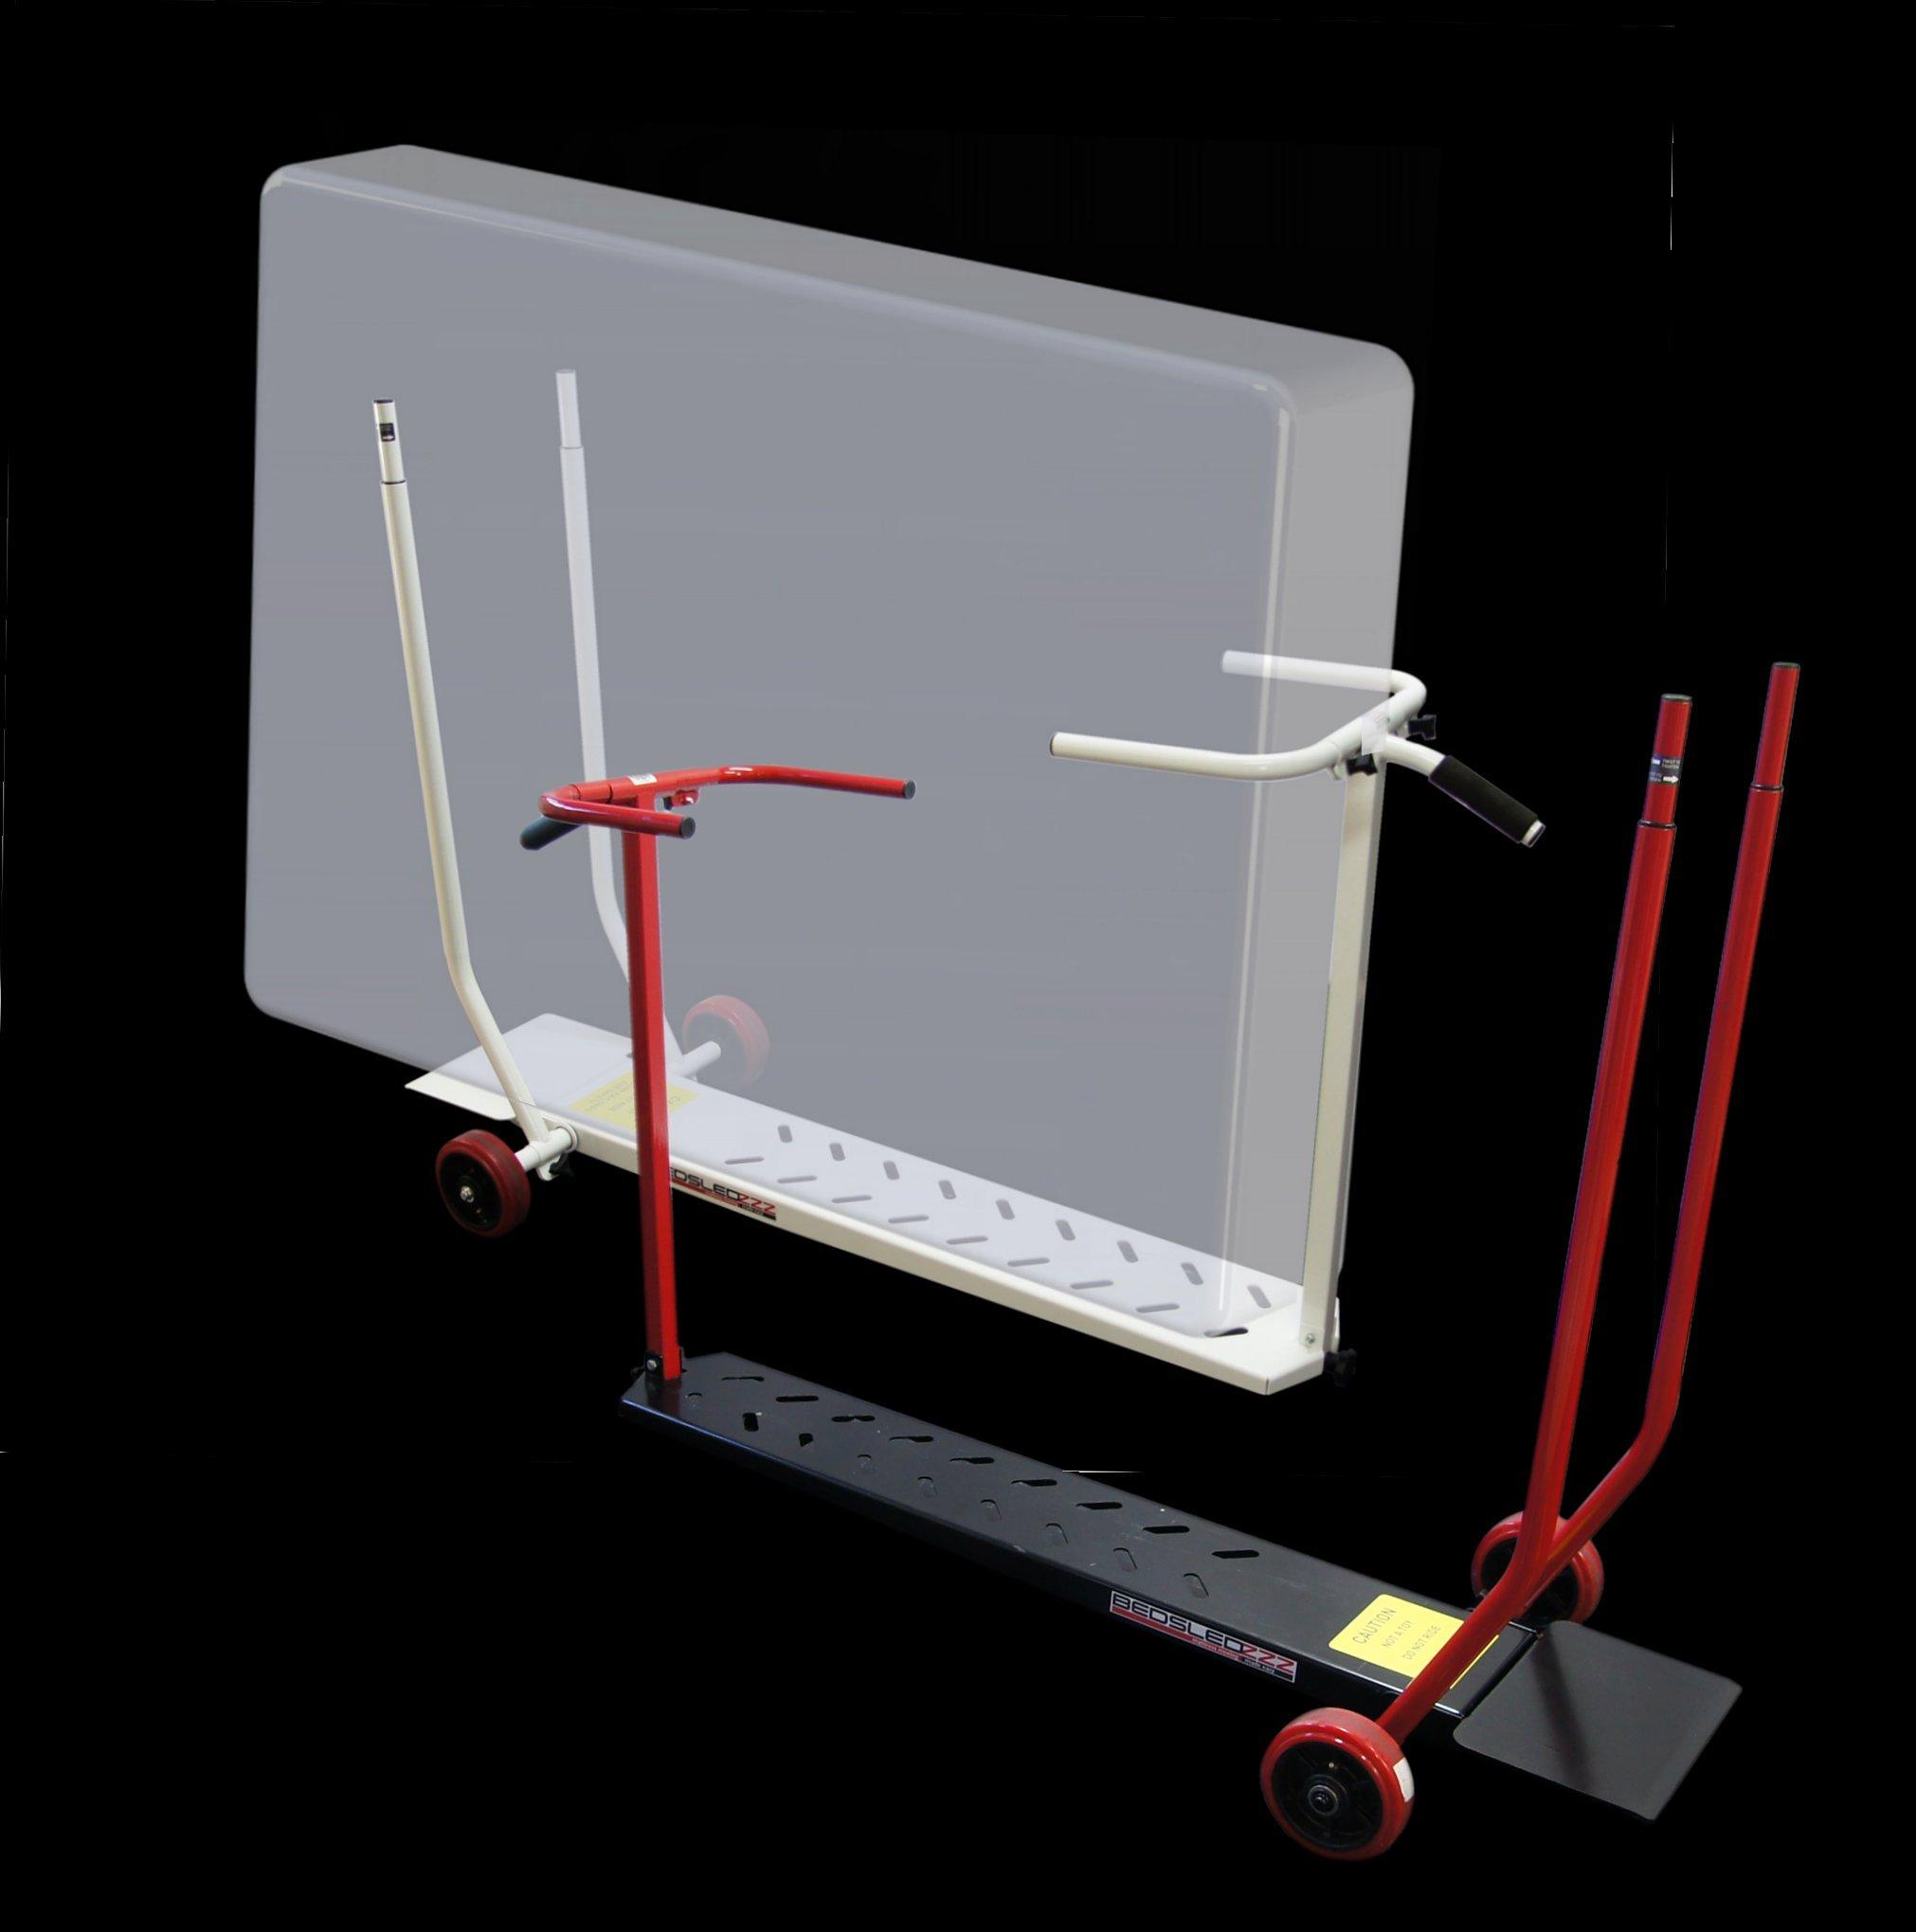 Bedsledzzz Mattress Cart Dolly, Hotel, Motel, Moving, Safety Red/Black